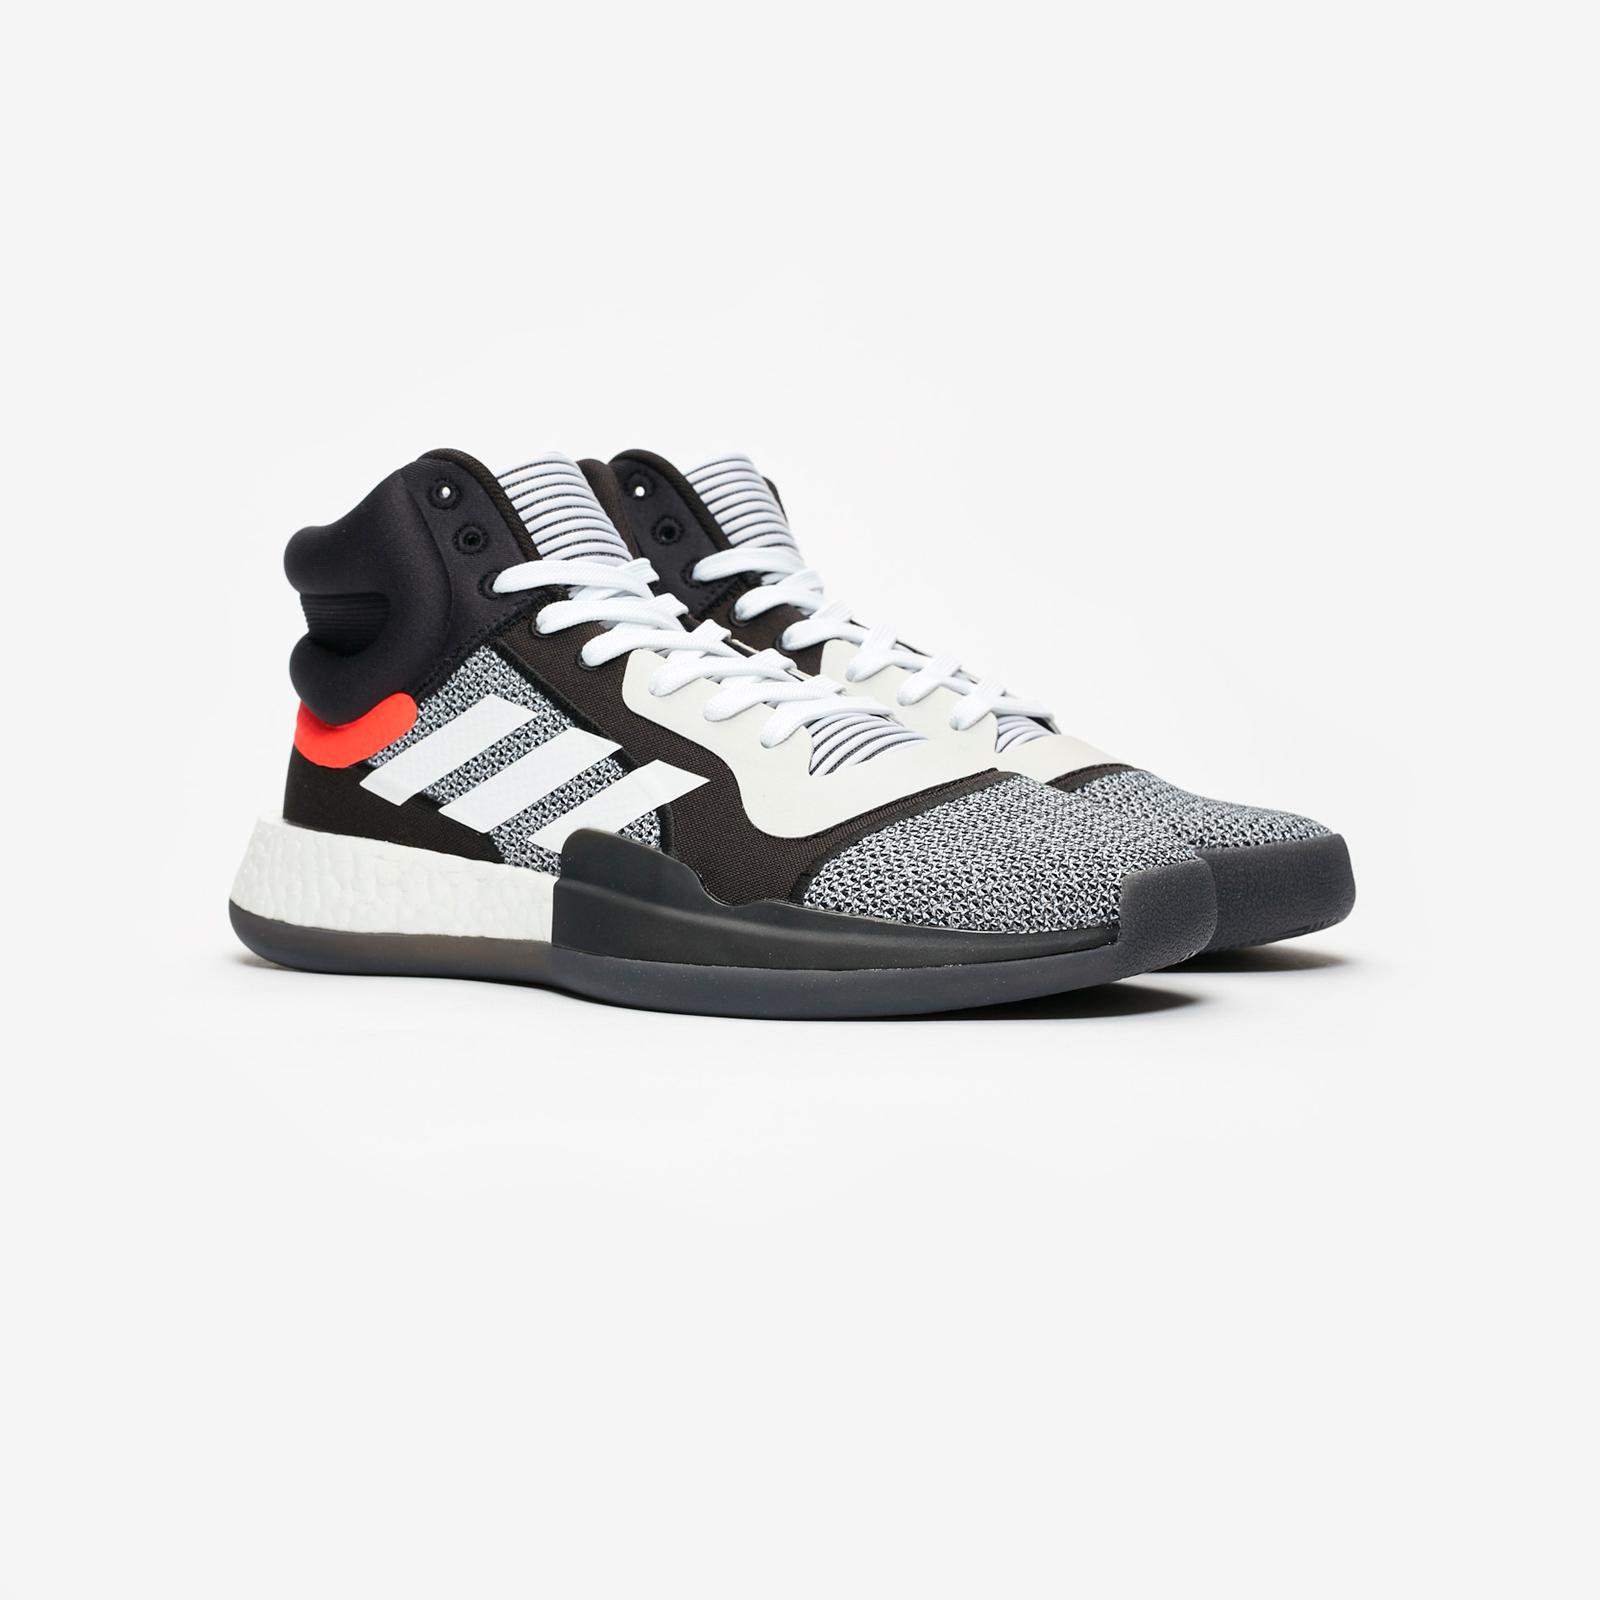 adidas Marquee Boost Bb7822 Sneakersnstuff   sneakers